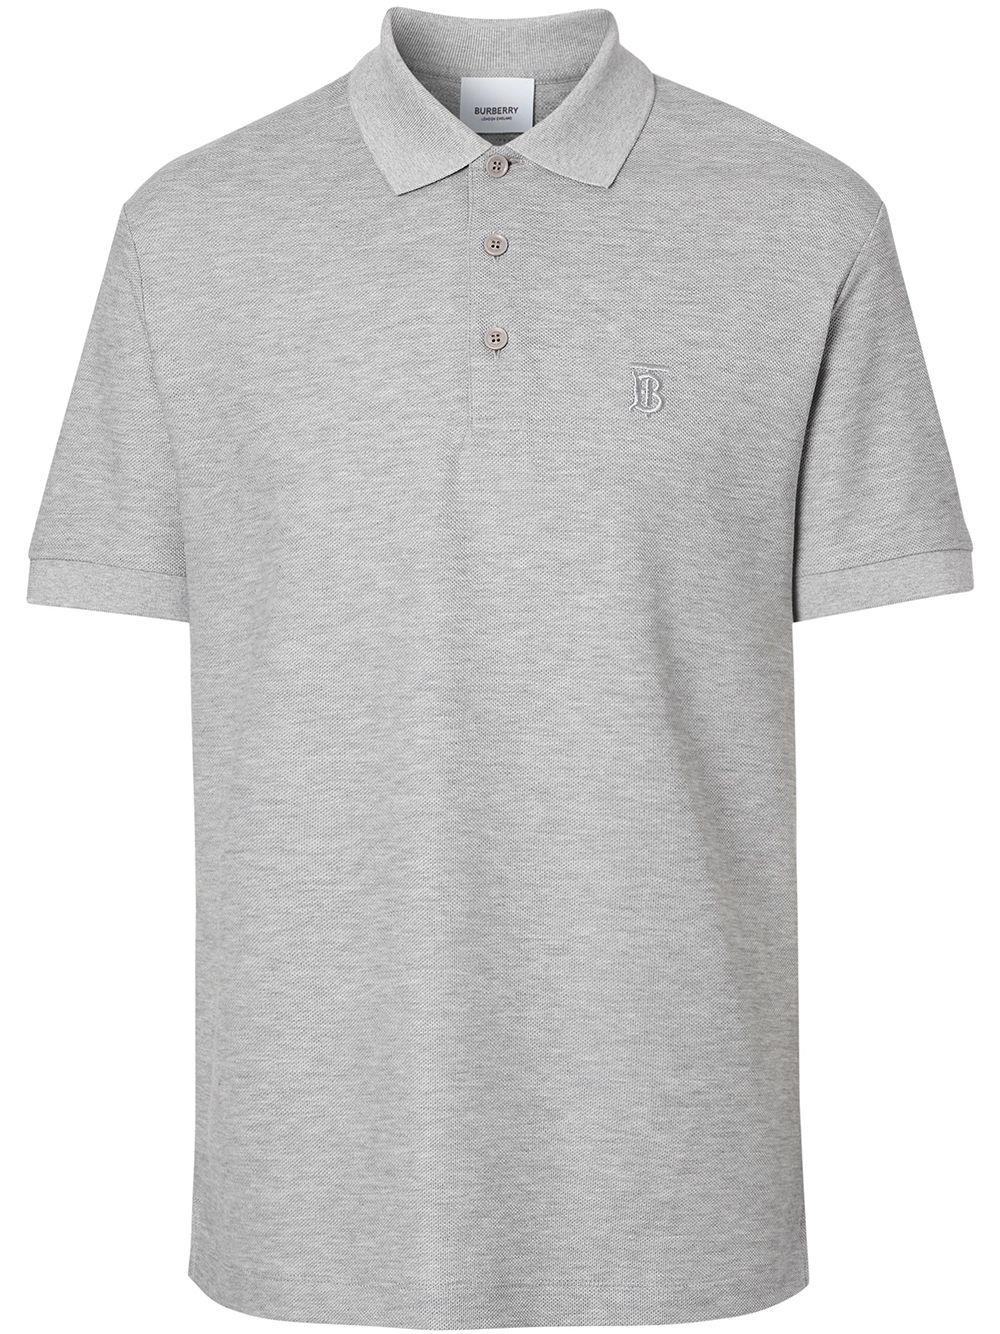 Burberry Poloshirt mit Monogramm - Grau